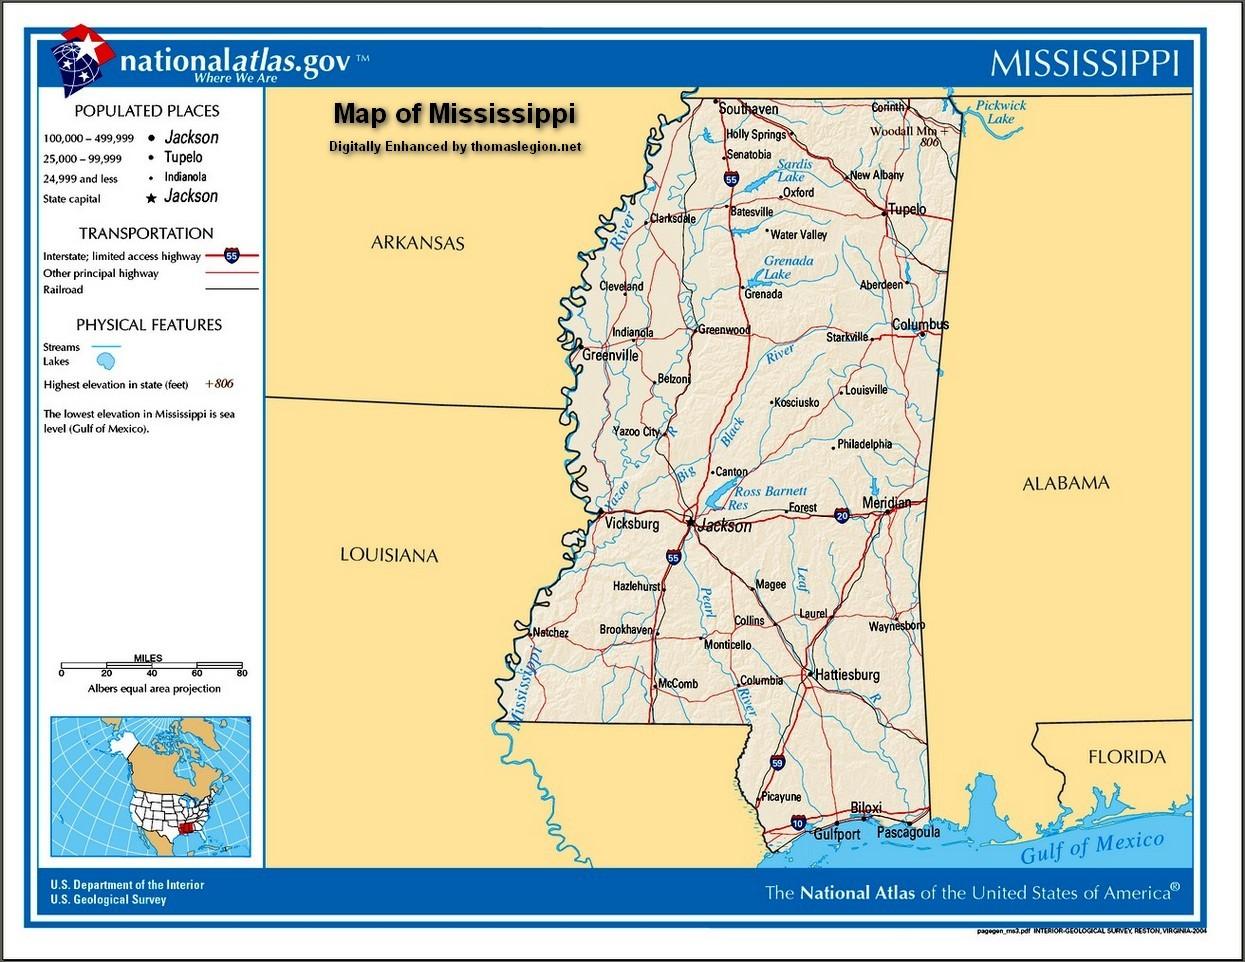 civil war battles battlefields high resolution map of mississippijpg